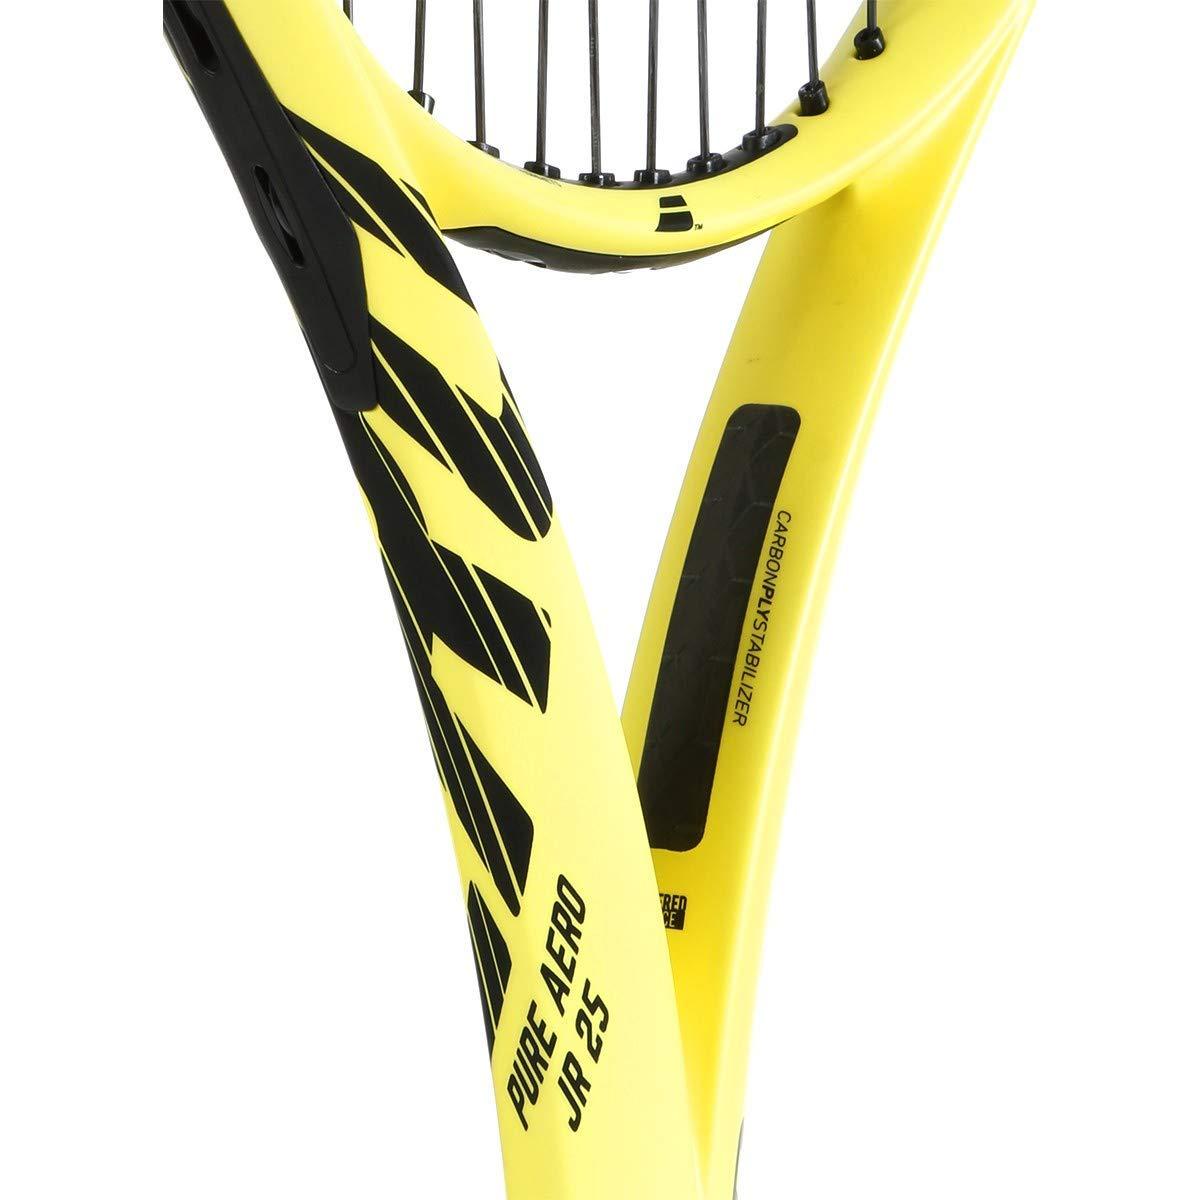 Amazon.com: Babolat Pure Aero Junior - Pala de tenis de 25 ...